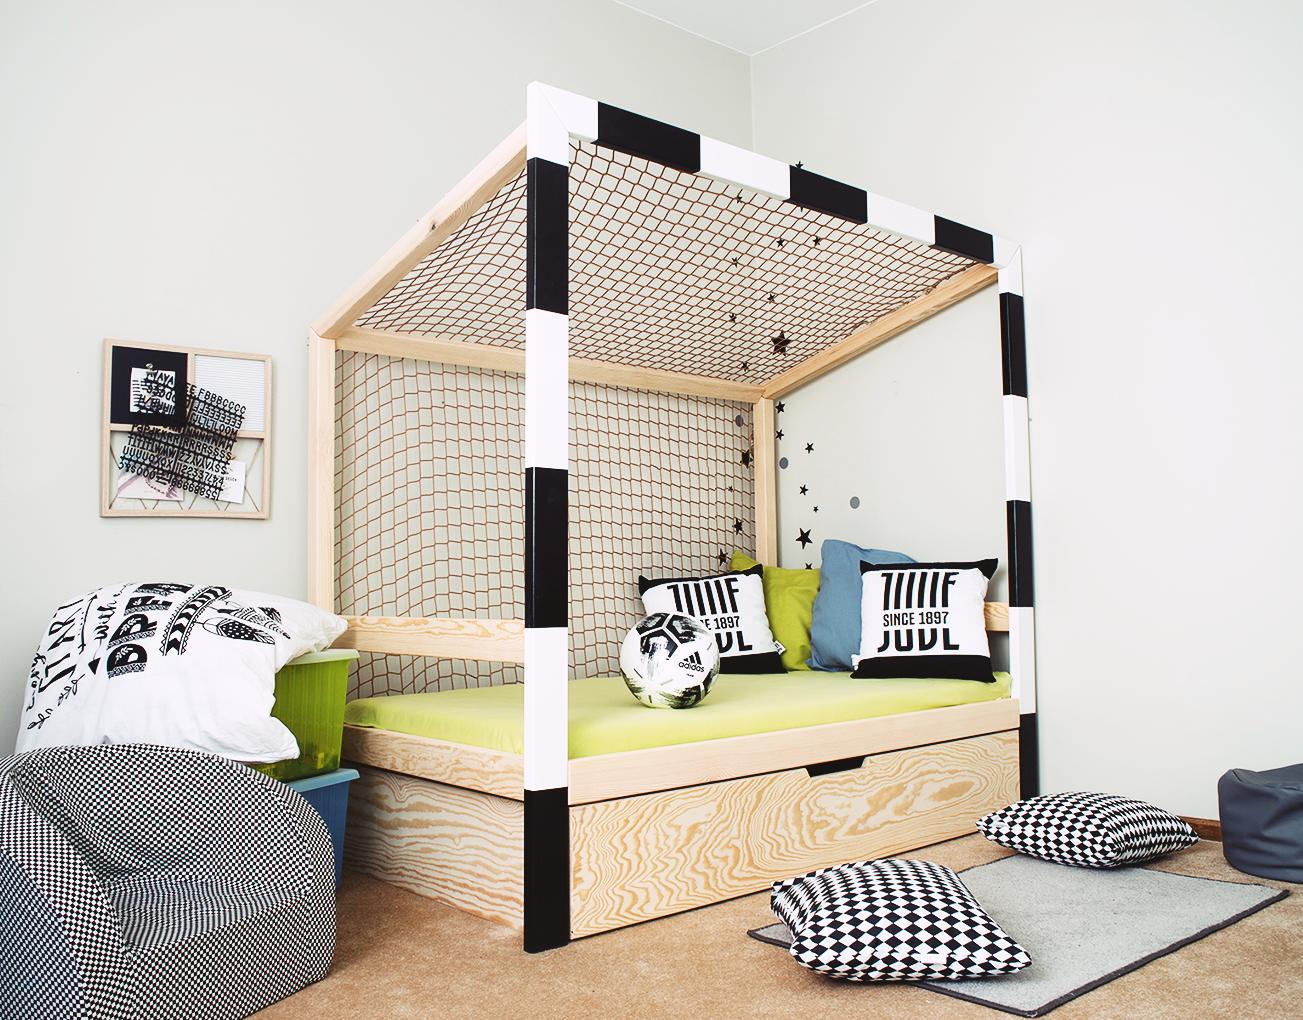 Full Size of Bett 190x90 Fuball Kinderbett 1594 Minimidi Design Home Affaire Bopita Einfaches Komplett Mit Bettkasten 140 X 200 Schlicht 140x200 Günstig 180x200 Weiß Bett Bett 190x90